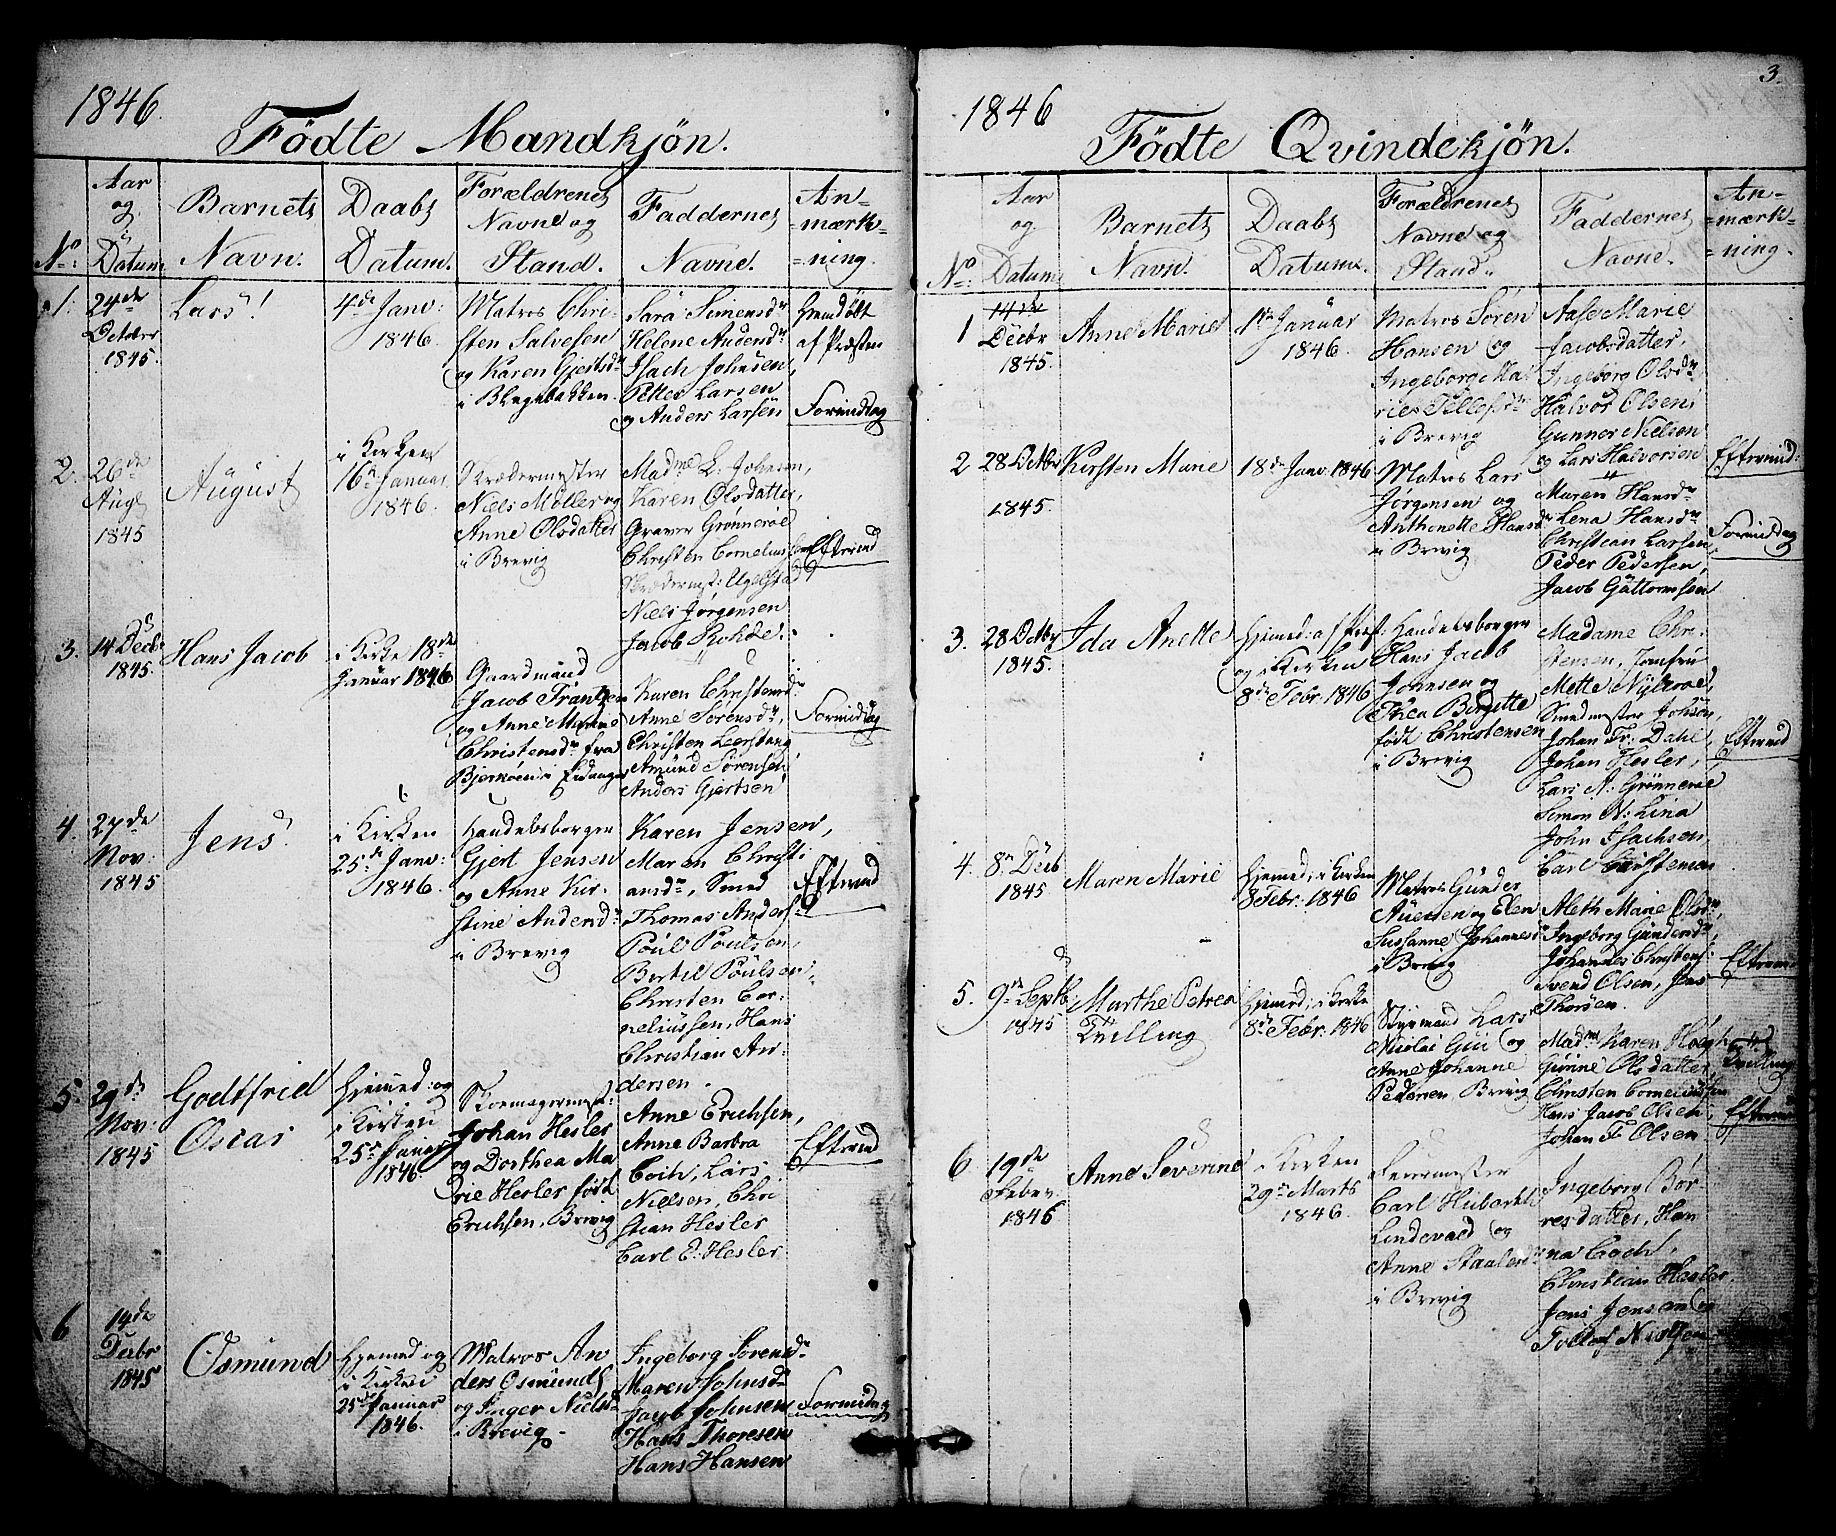 SAKO, Brevik kirkebøker, G/Ga/L0002: Klokkerbok nr. 2, 1846-1865, s. 3